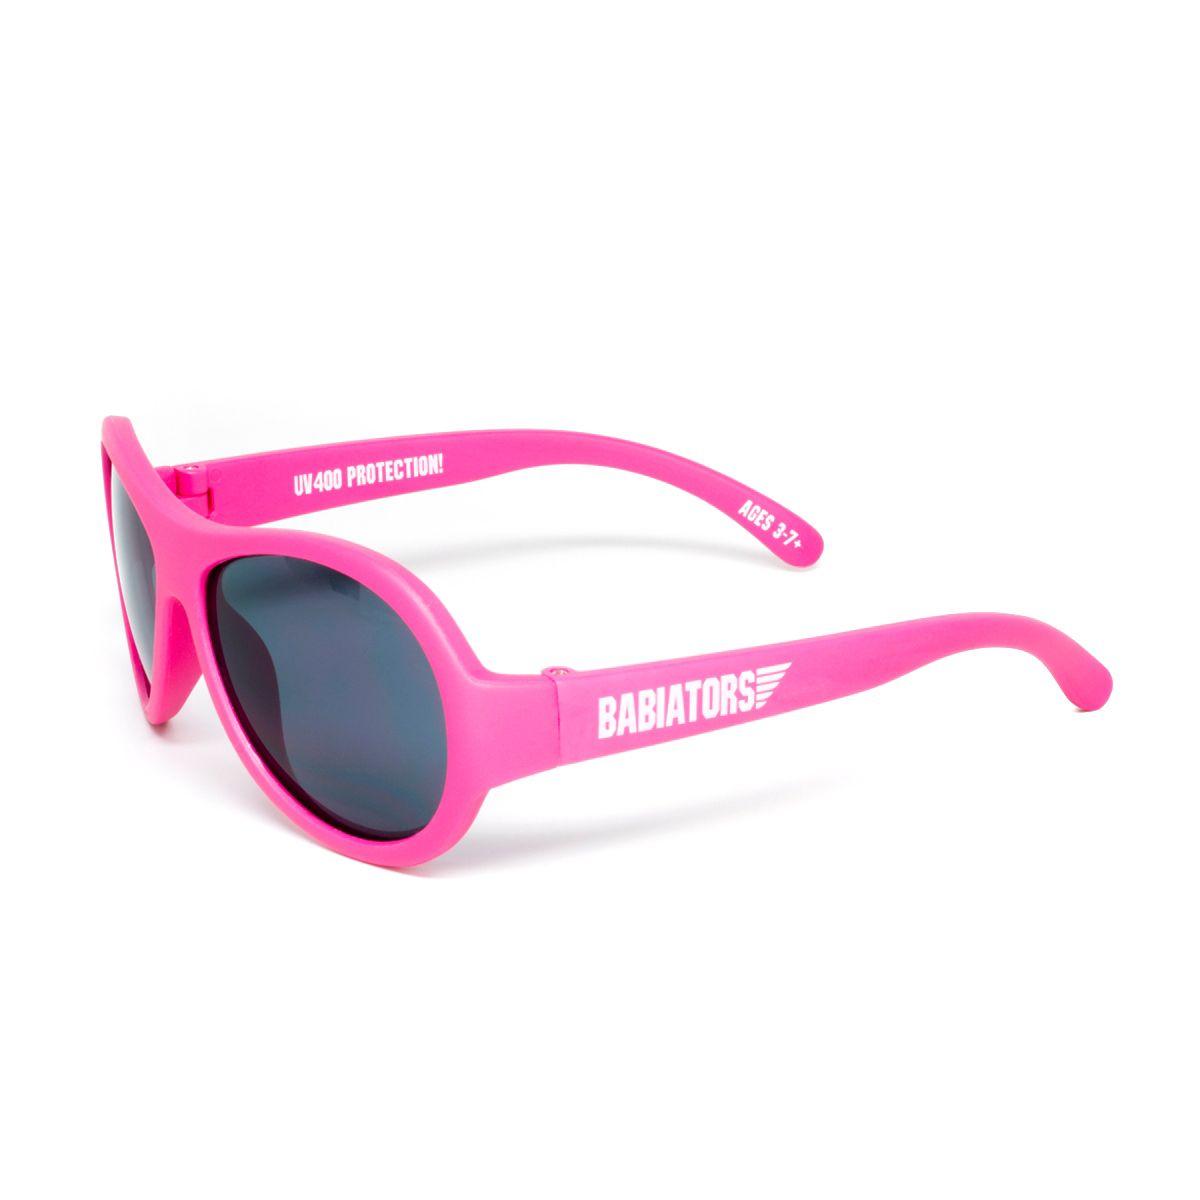 01faf75f0c9 Παιδικά γυαλιά ηλίου Aviator